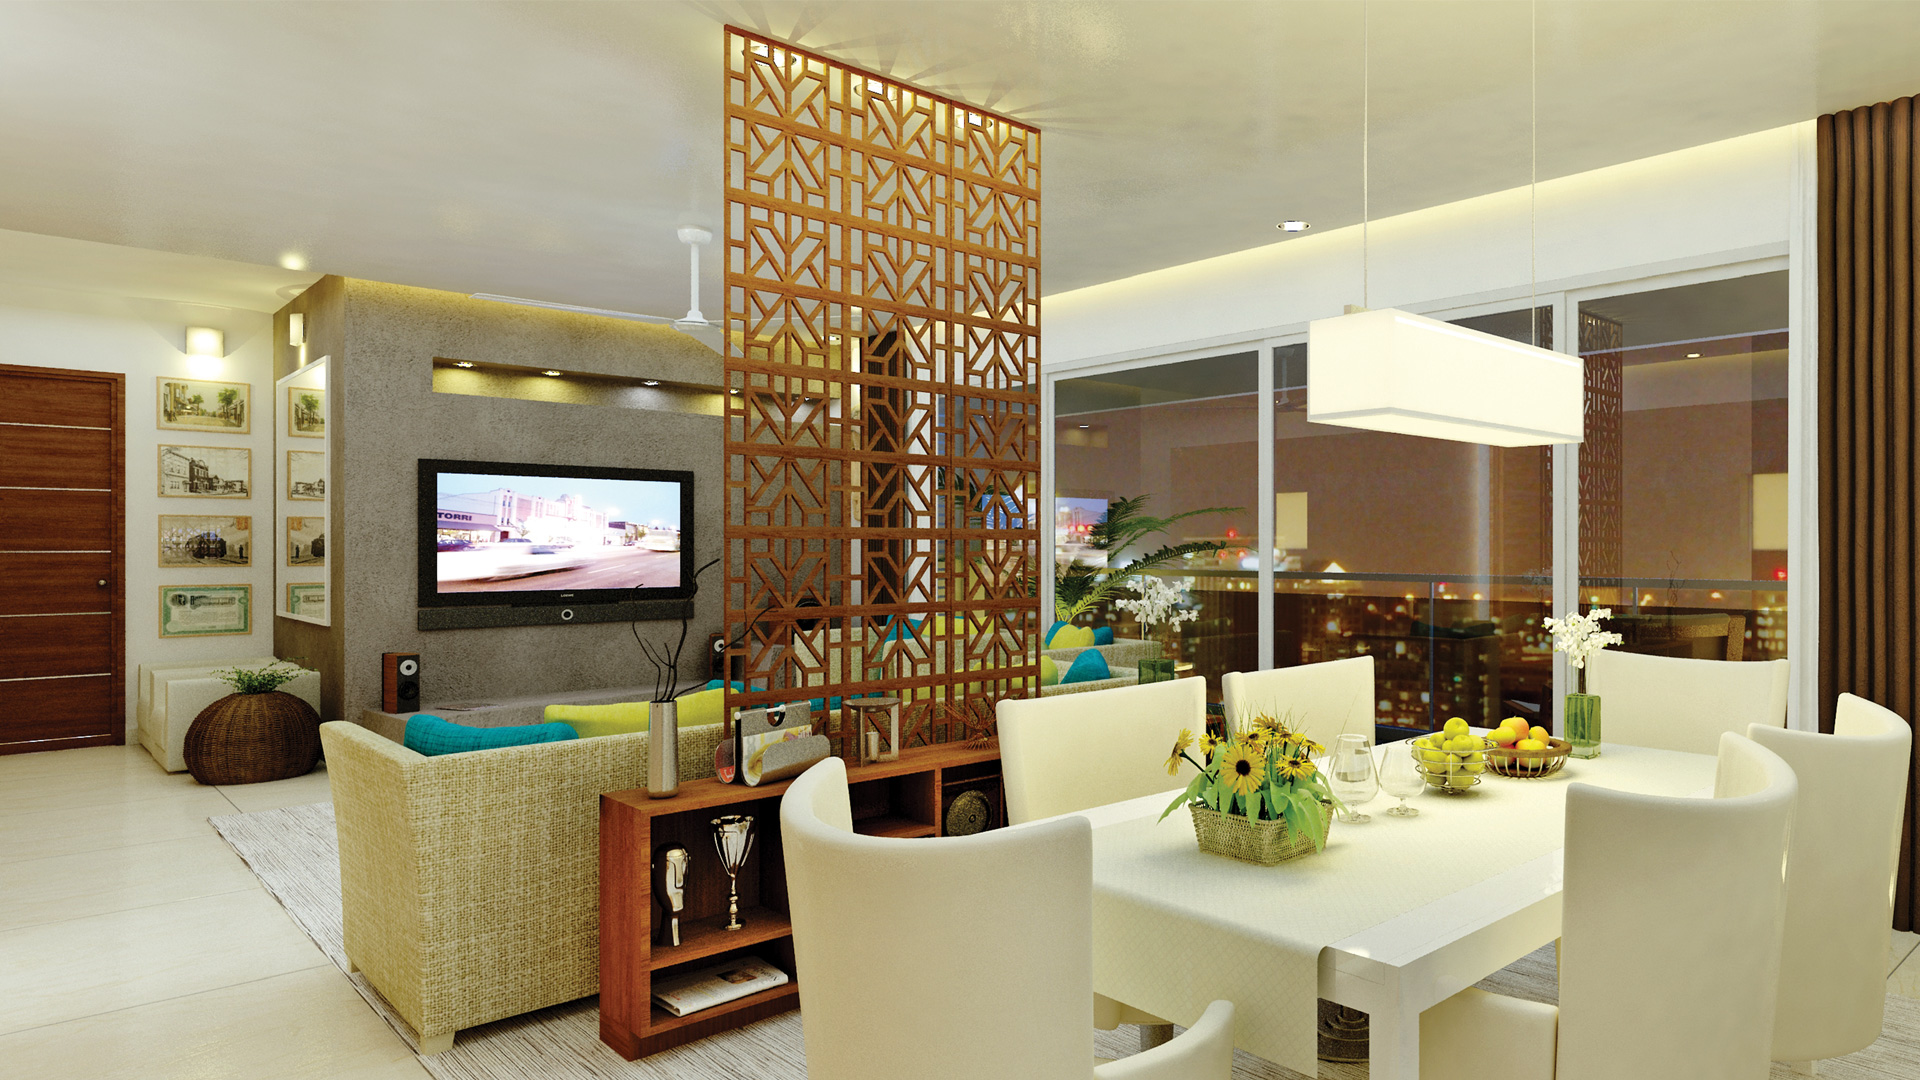 prestige-fairfield-Apartment-in-Dollars-colony-Sanjay-Nagar-Bangalore-Image-04